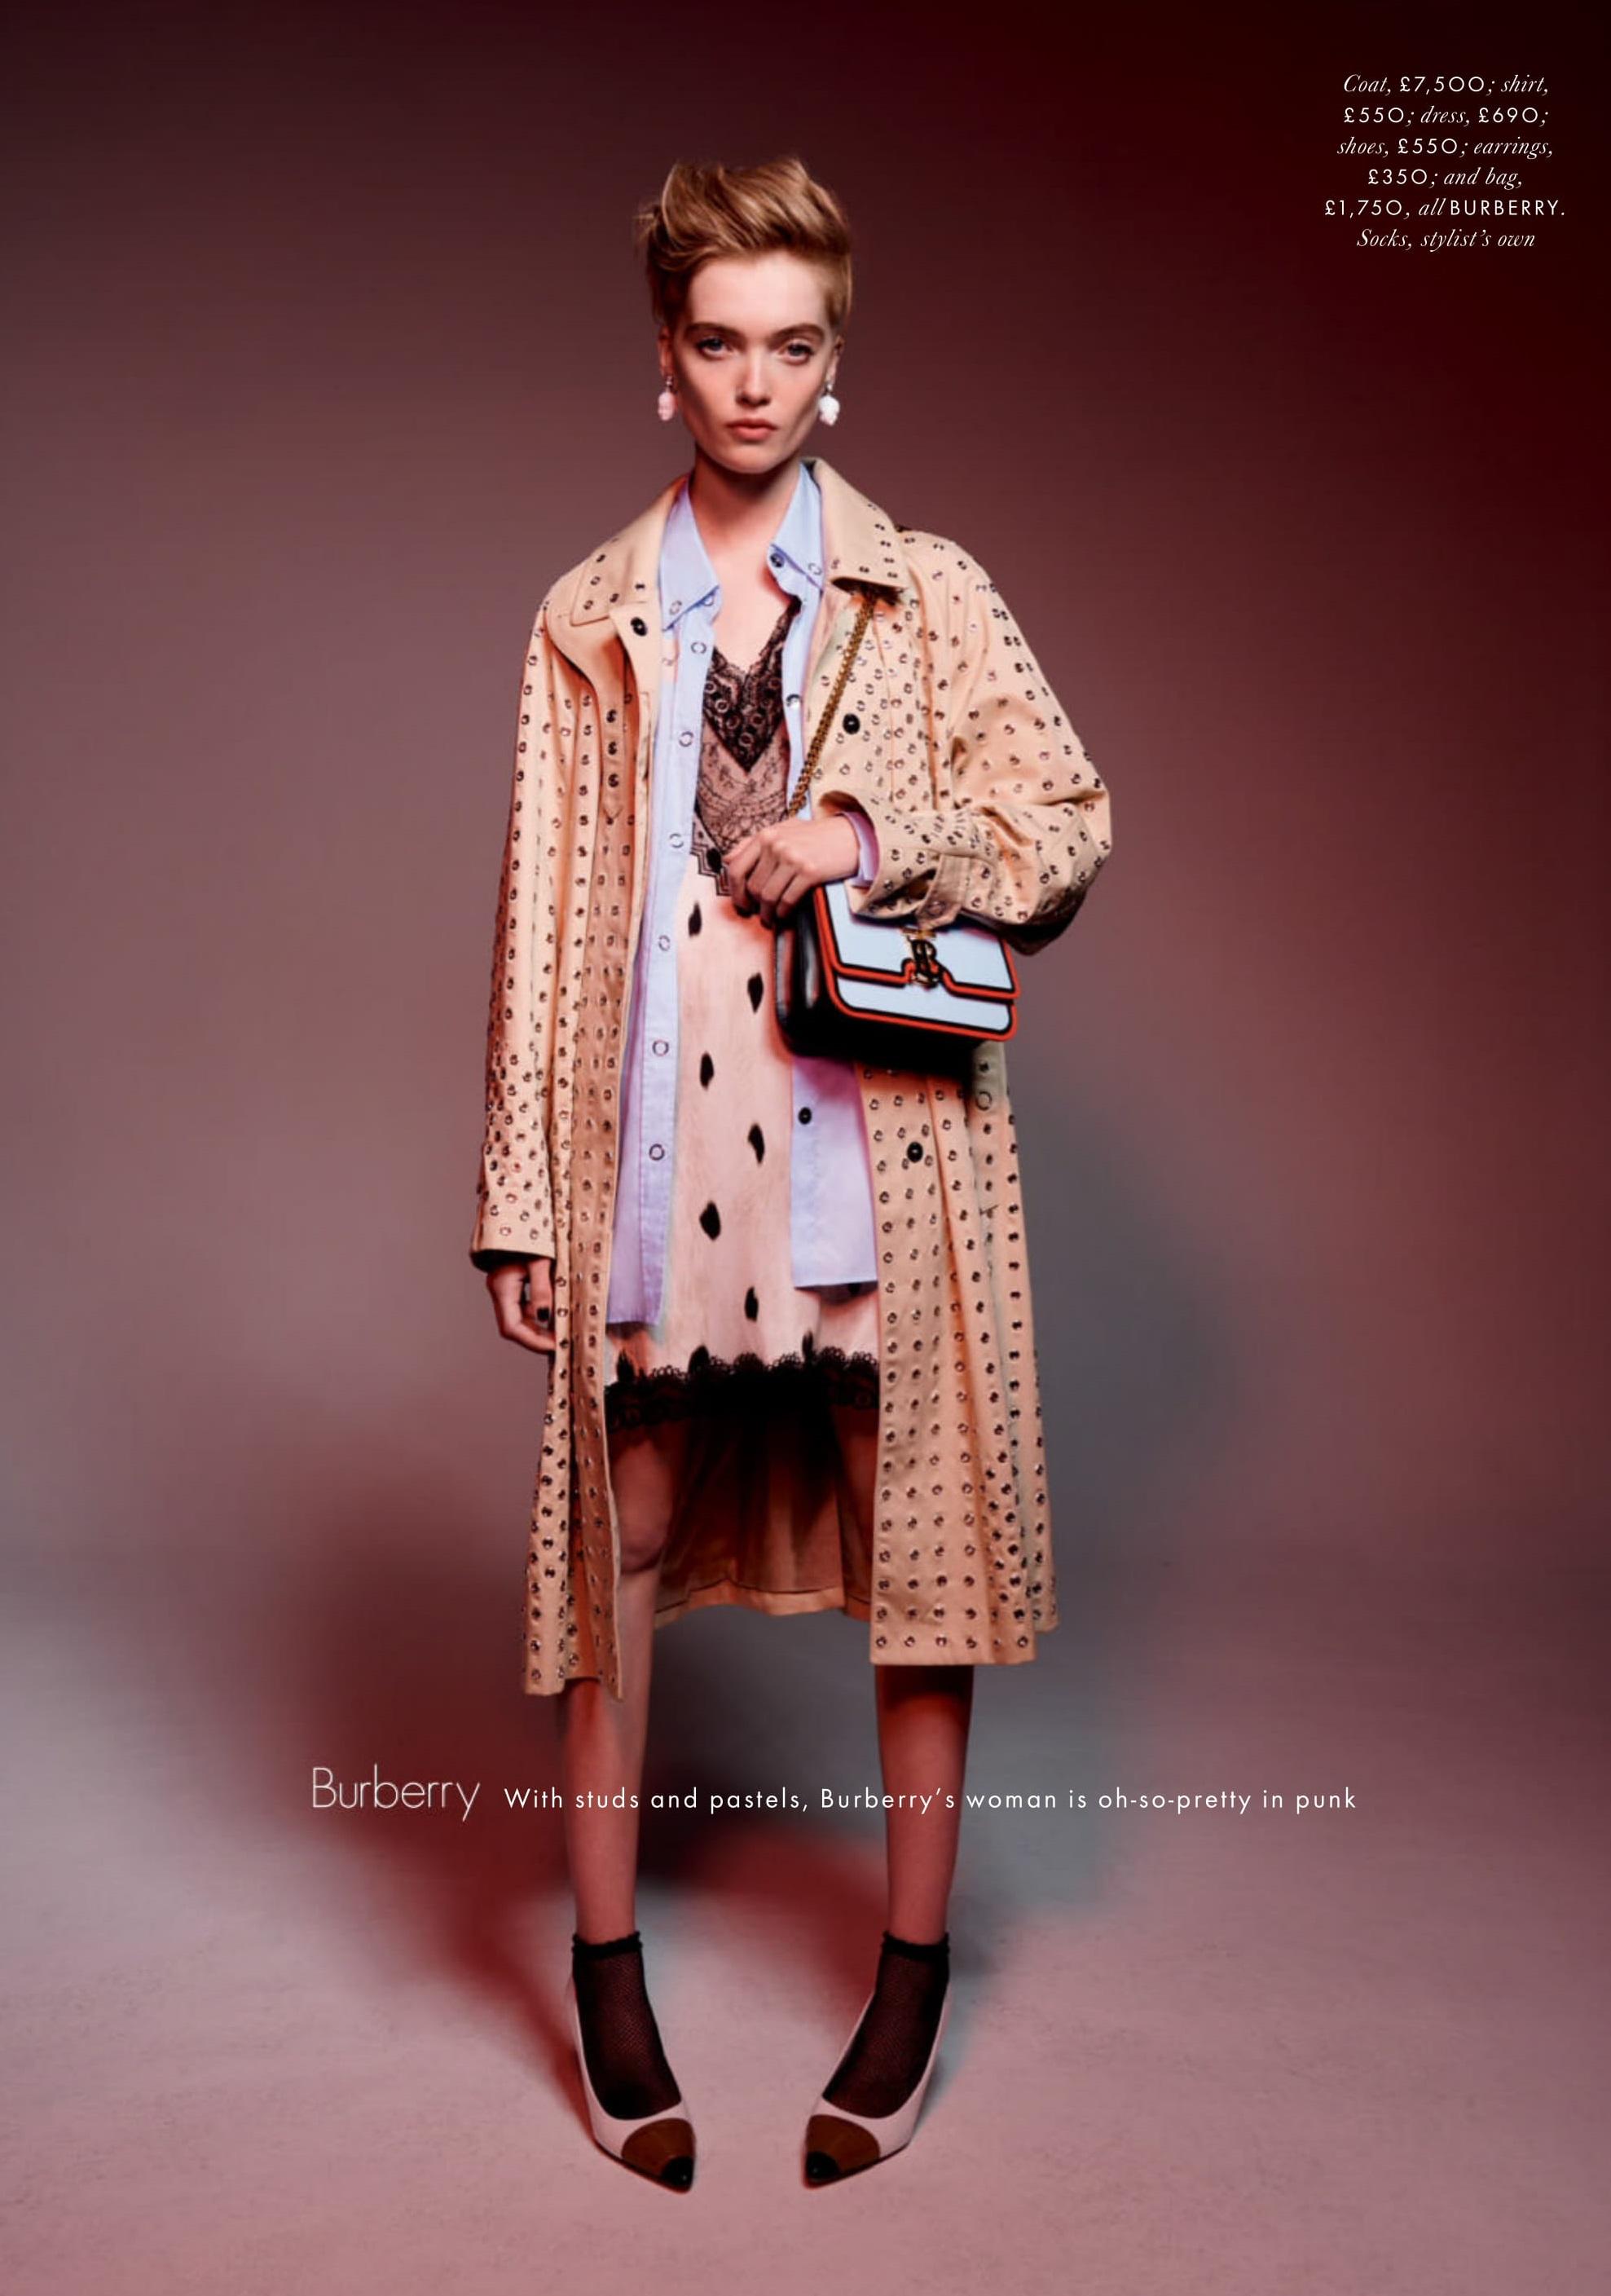 Ruth Bell Vogue UK Feb 2019 London Look (11).jpg